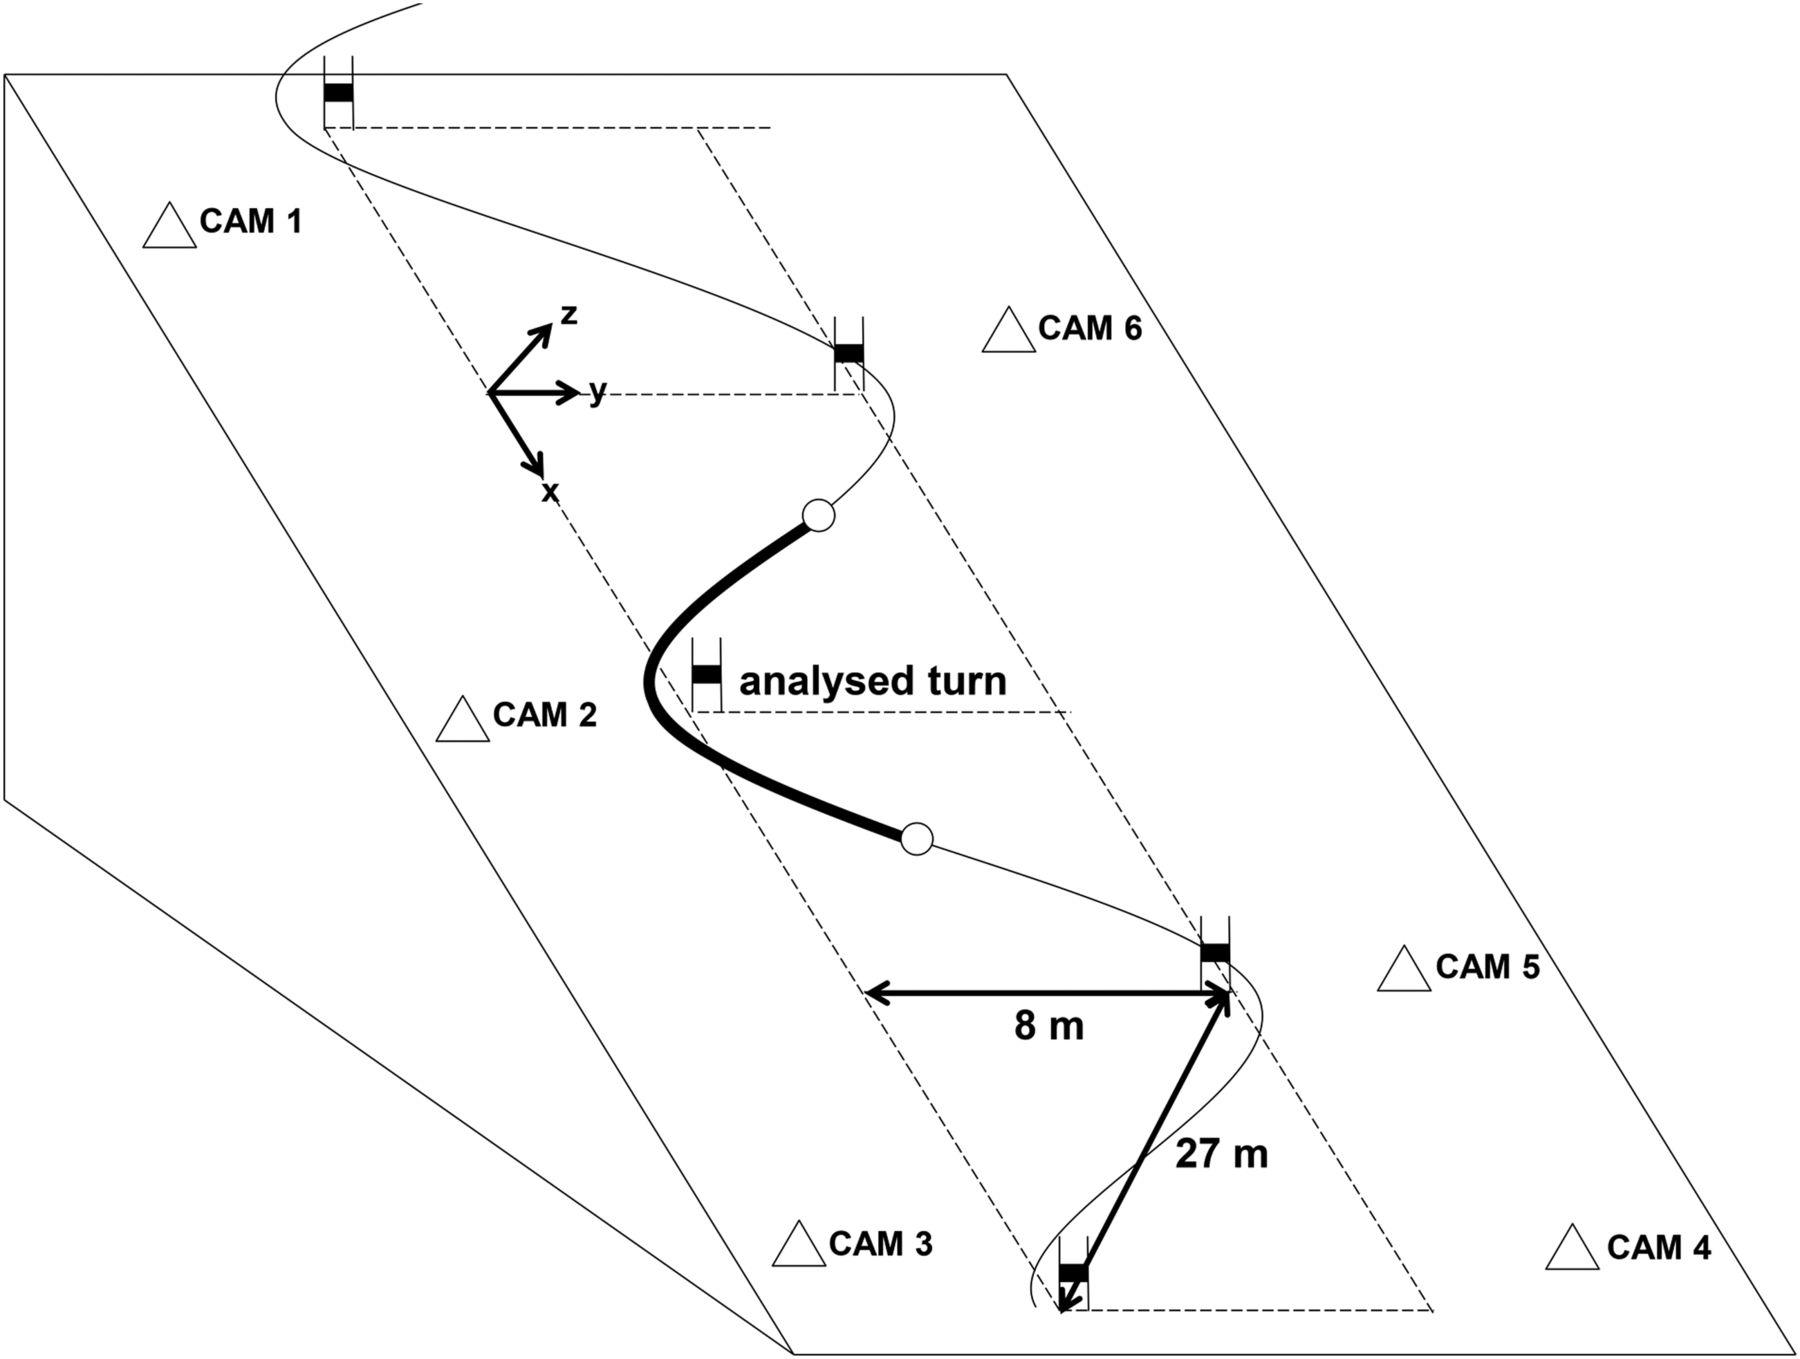 Sidecut Radius And The Mechanics Of Turning Equipment Designed To Reduce Risk Of Severe